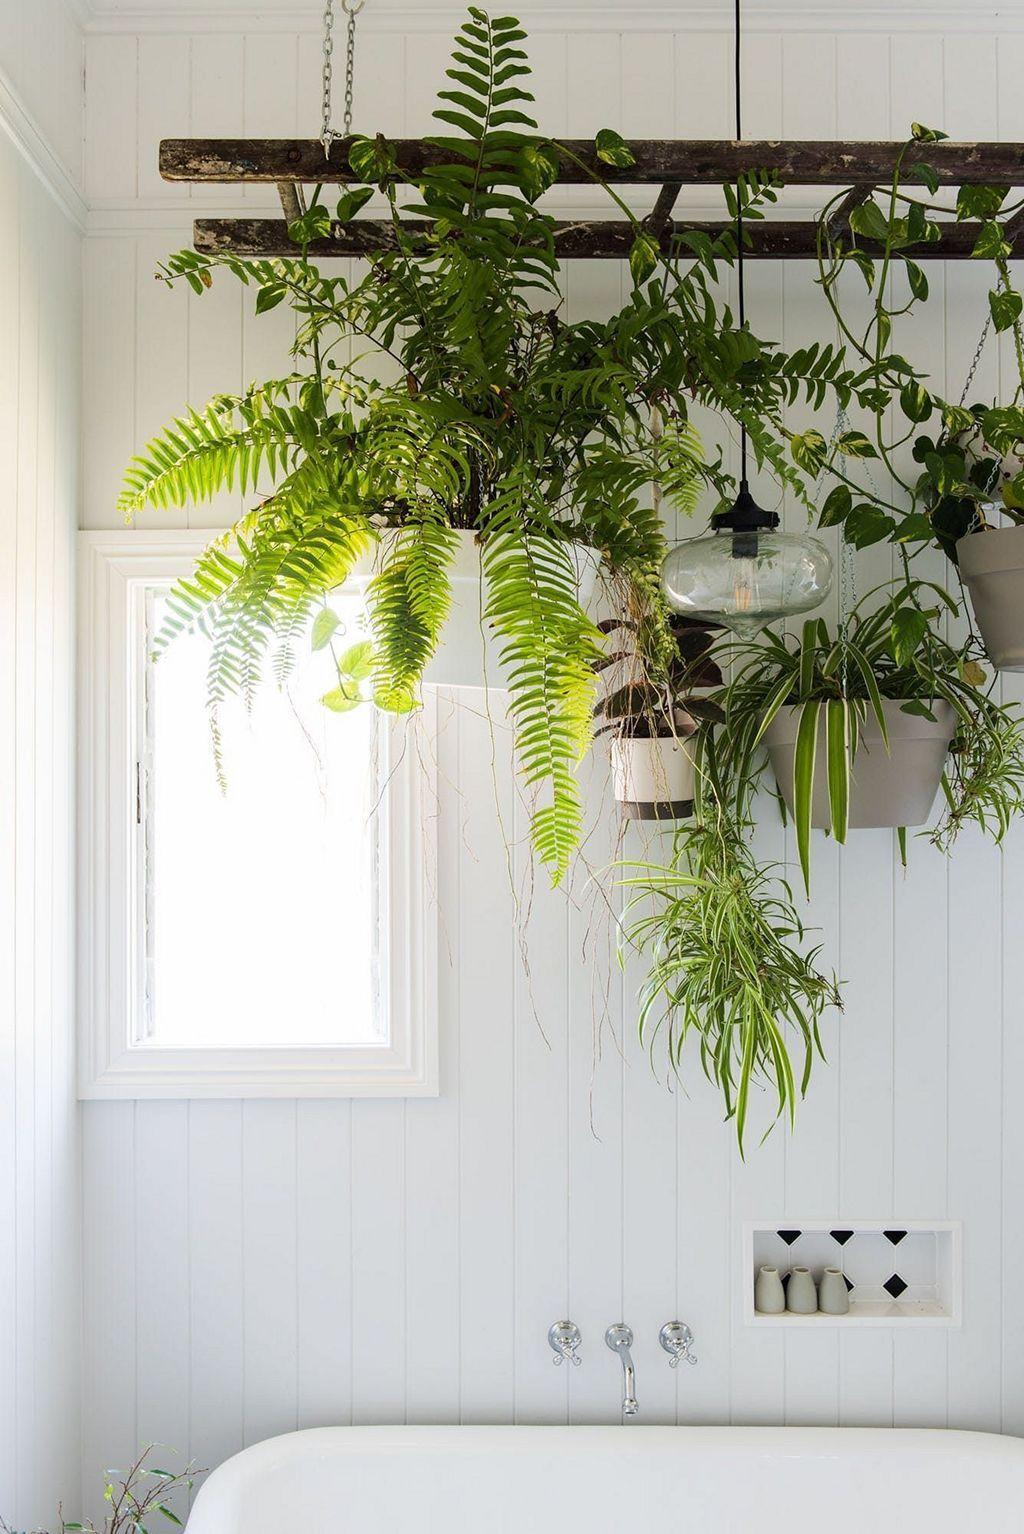 inspiring hanging plants ideas for bathroom in bathroom